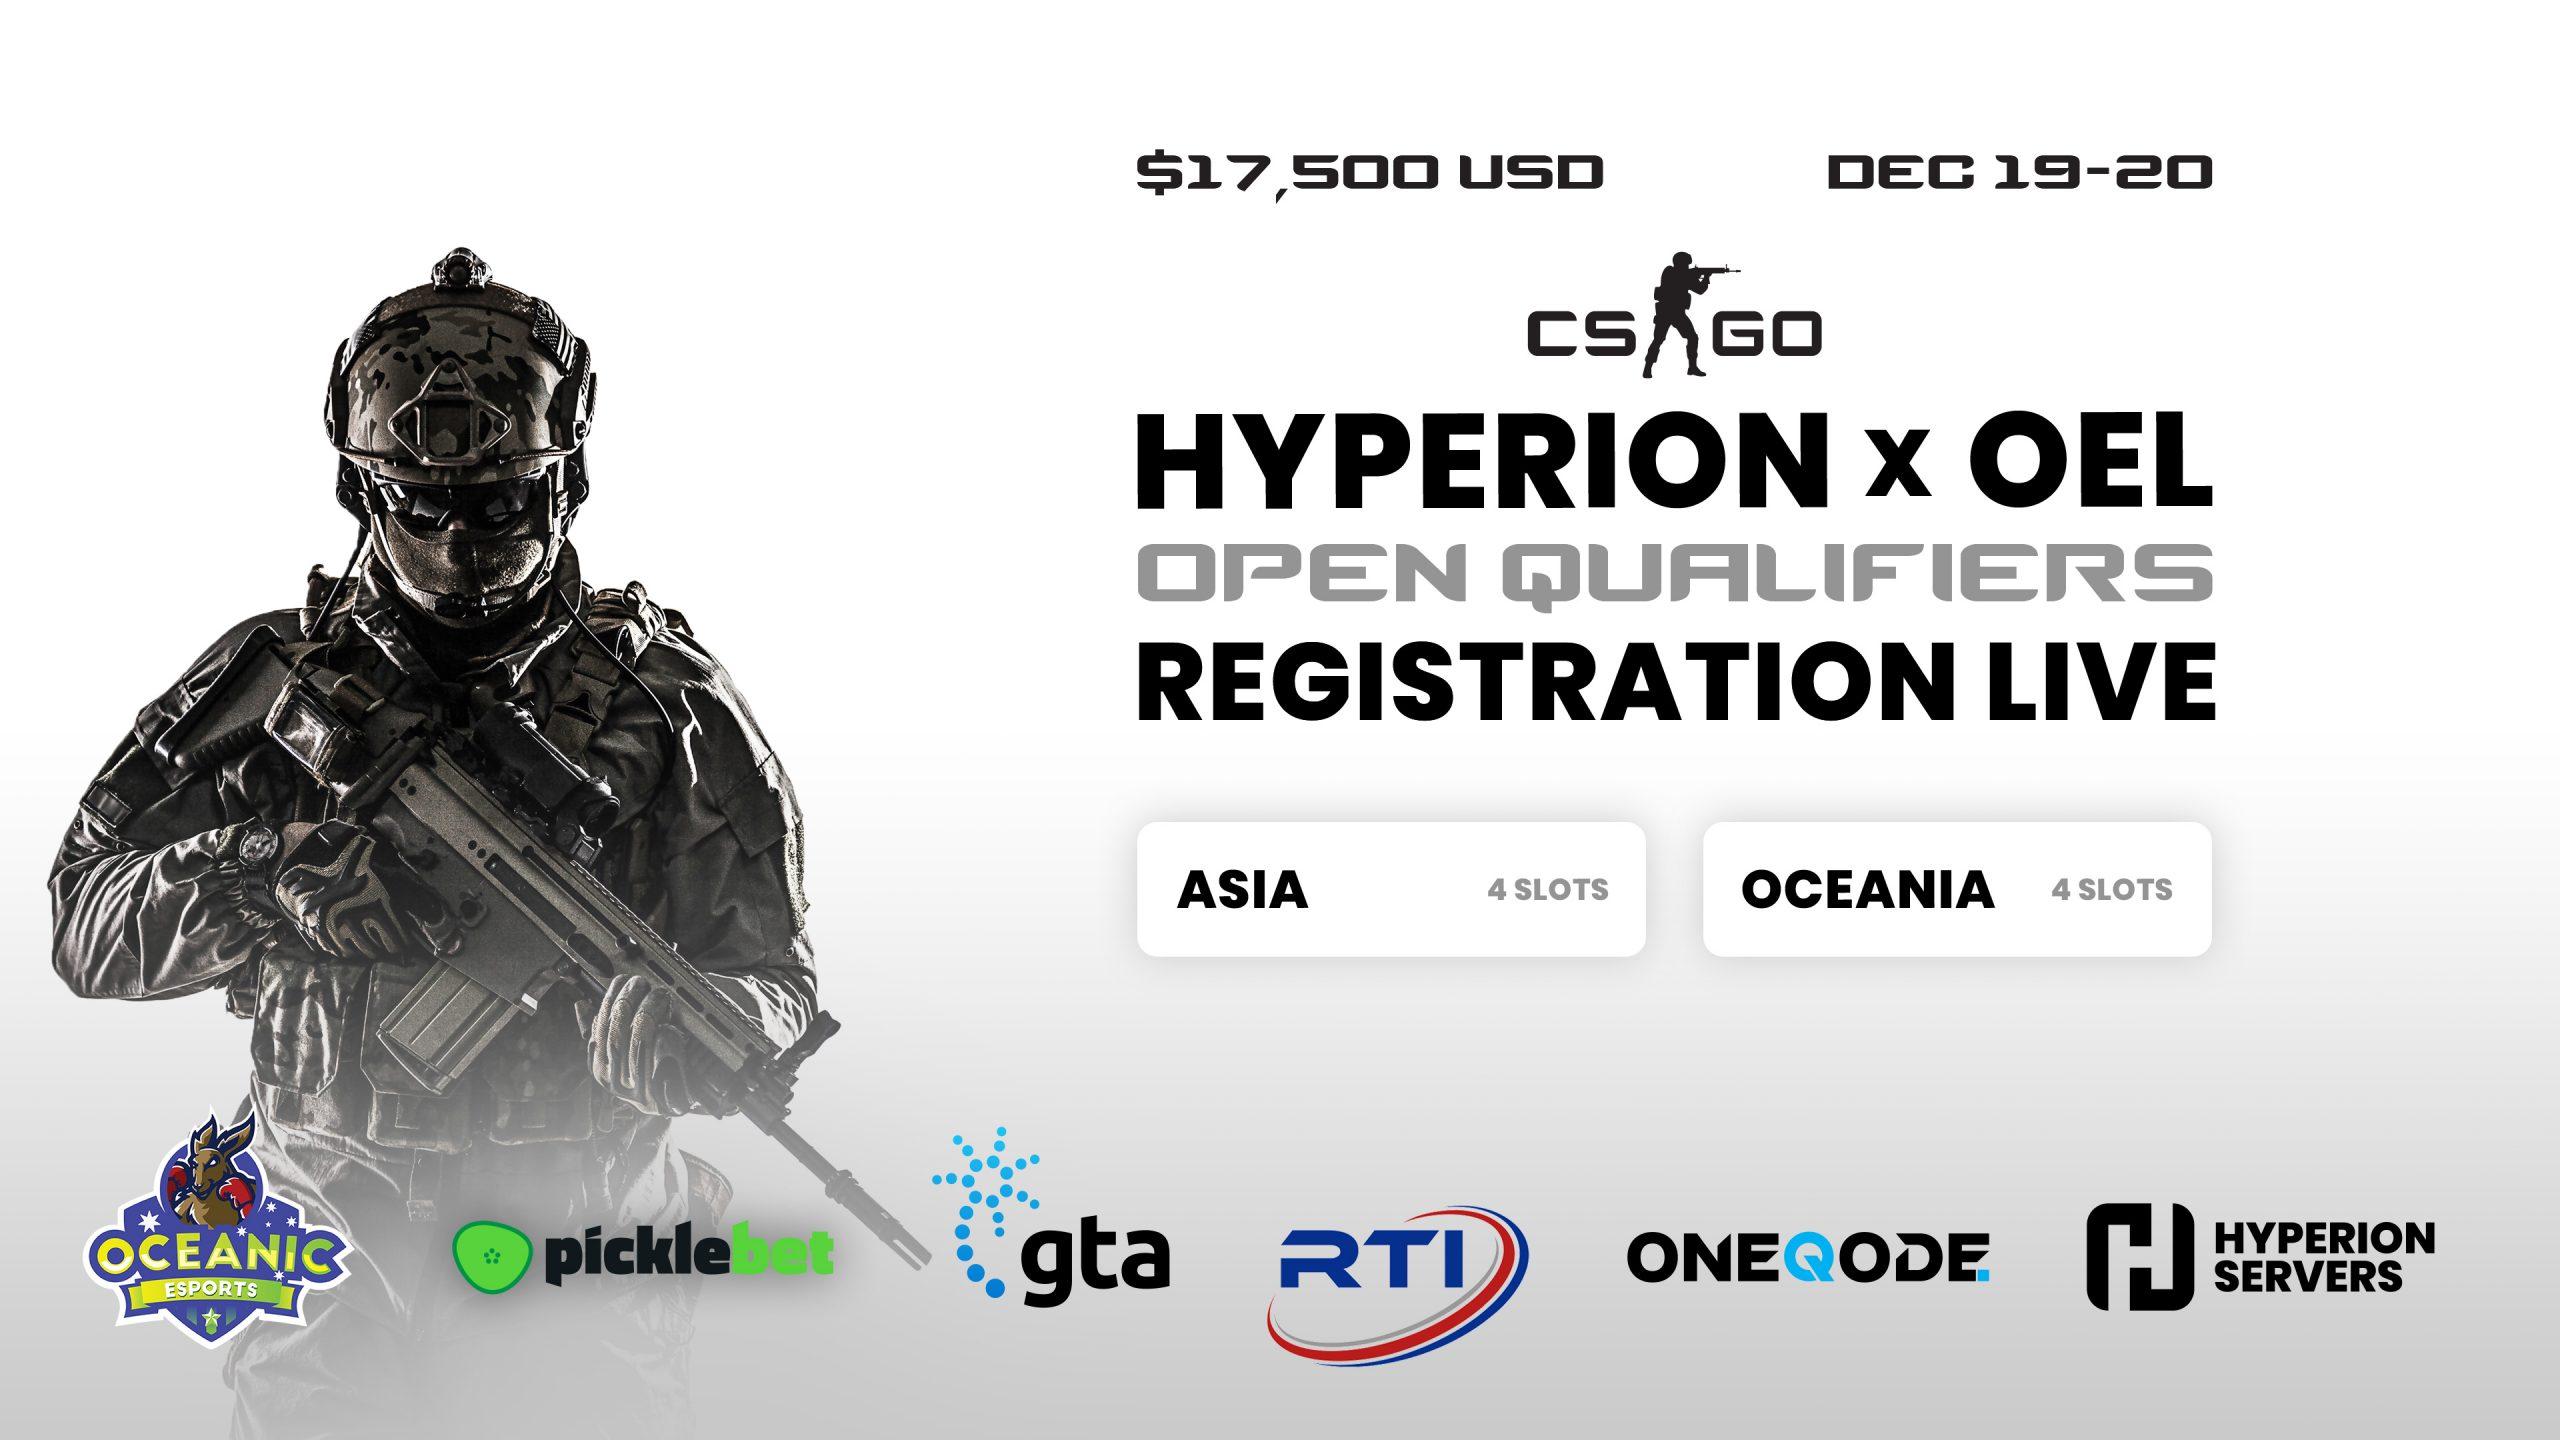 Hyperion x OEL Inter-Regional CS:GO Launch Open Qualifier – Announcement Presser